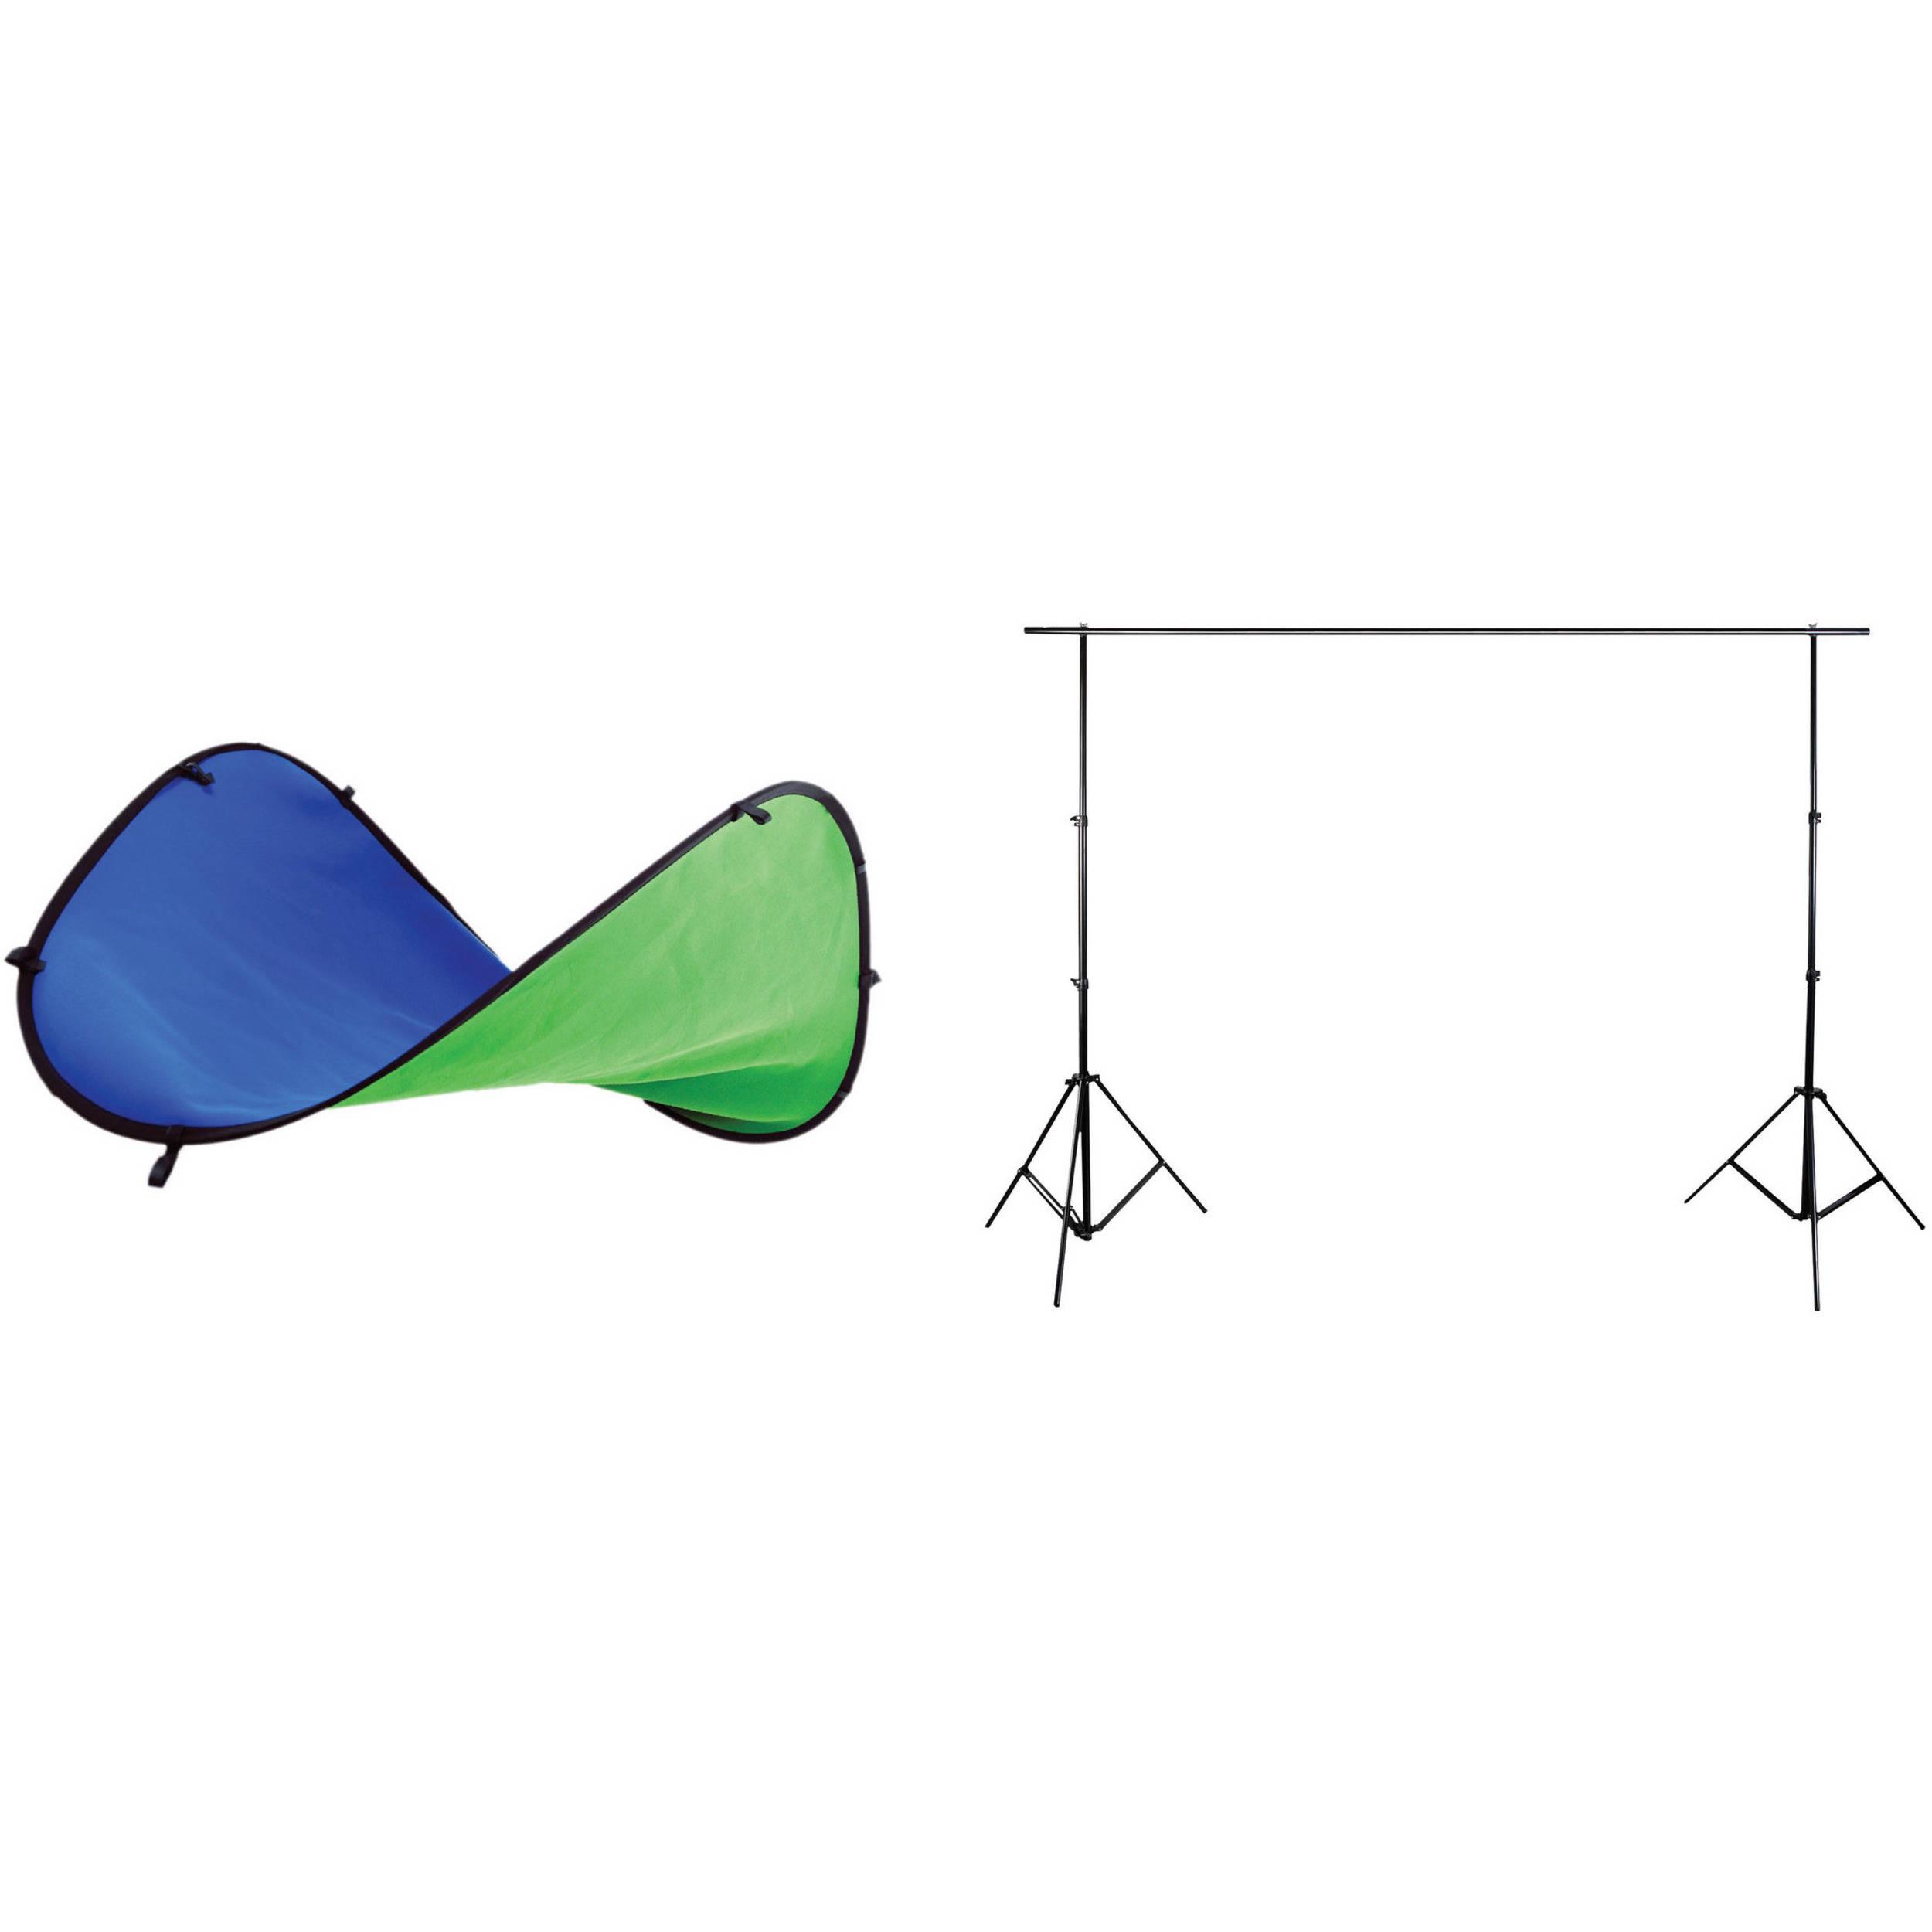 Digital Juice 5 x 7' Chroma Pop Portable Blue Green Screen Studio with  Stand Kit